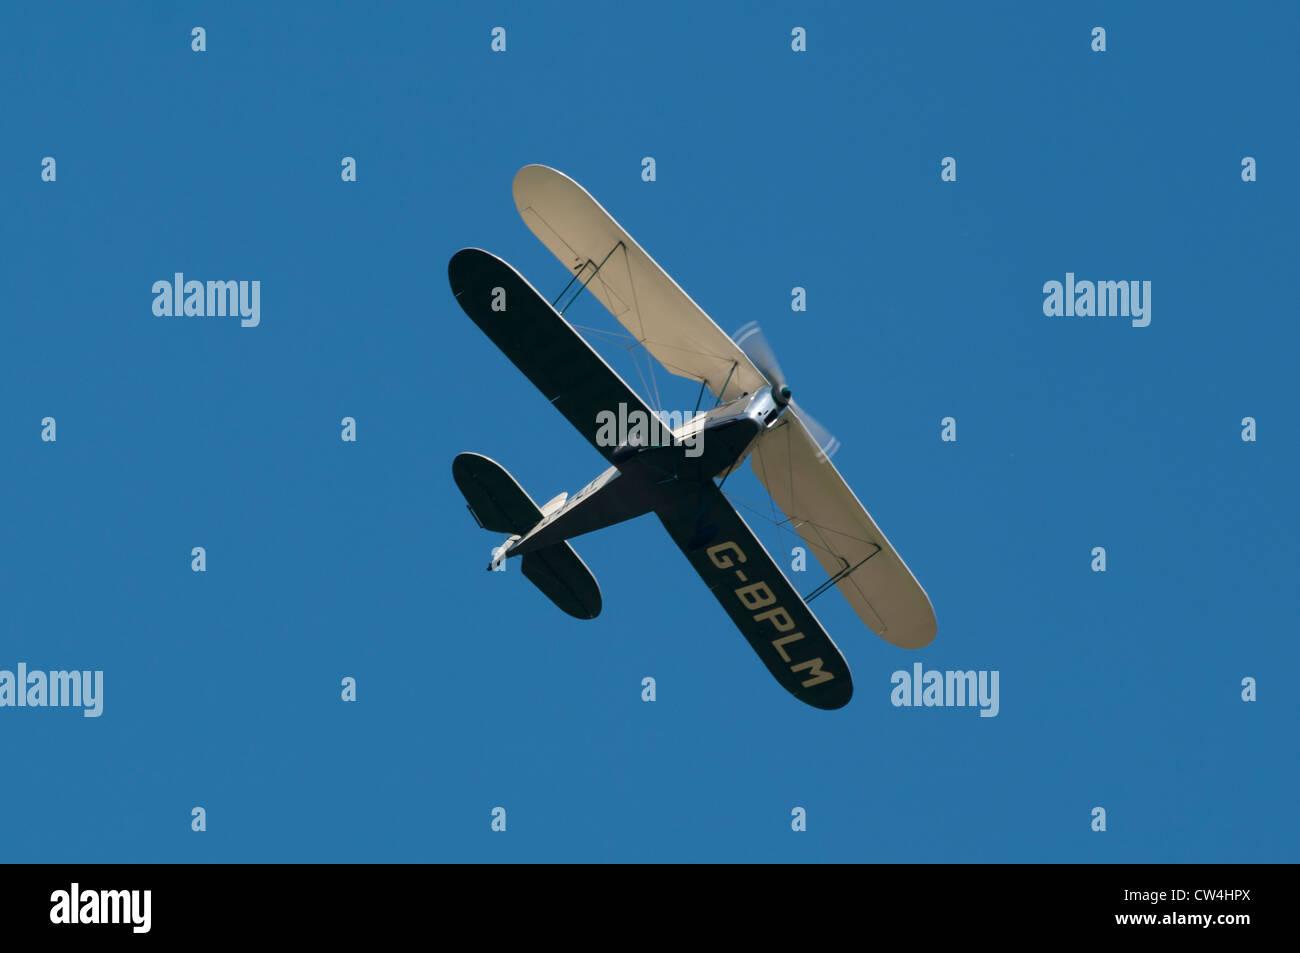 The Stampe Biplane Bi Plane Formation Display Team UK - Stock Image